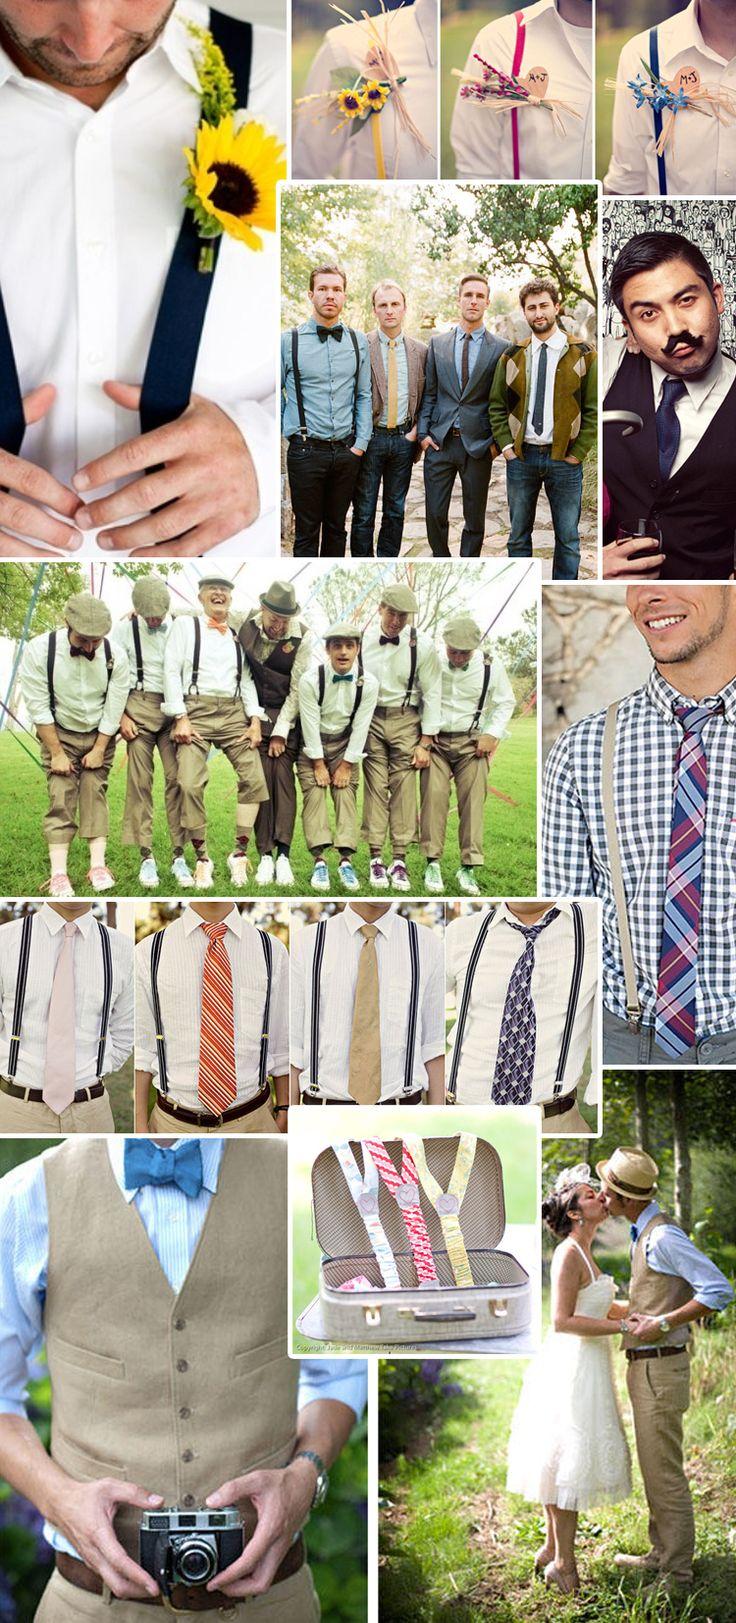 Old Fashioned Style Trendy for Modern Weddings #thebestweddingblogever #groomsmen #vintage